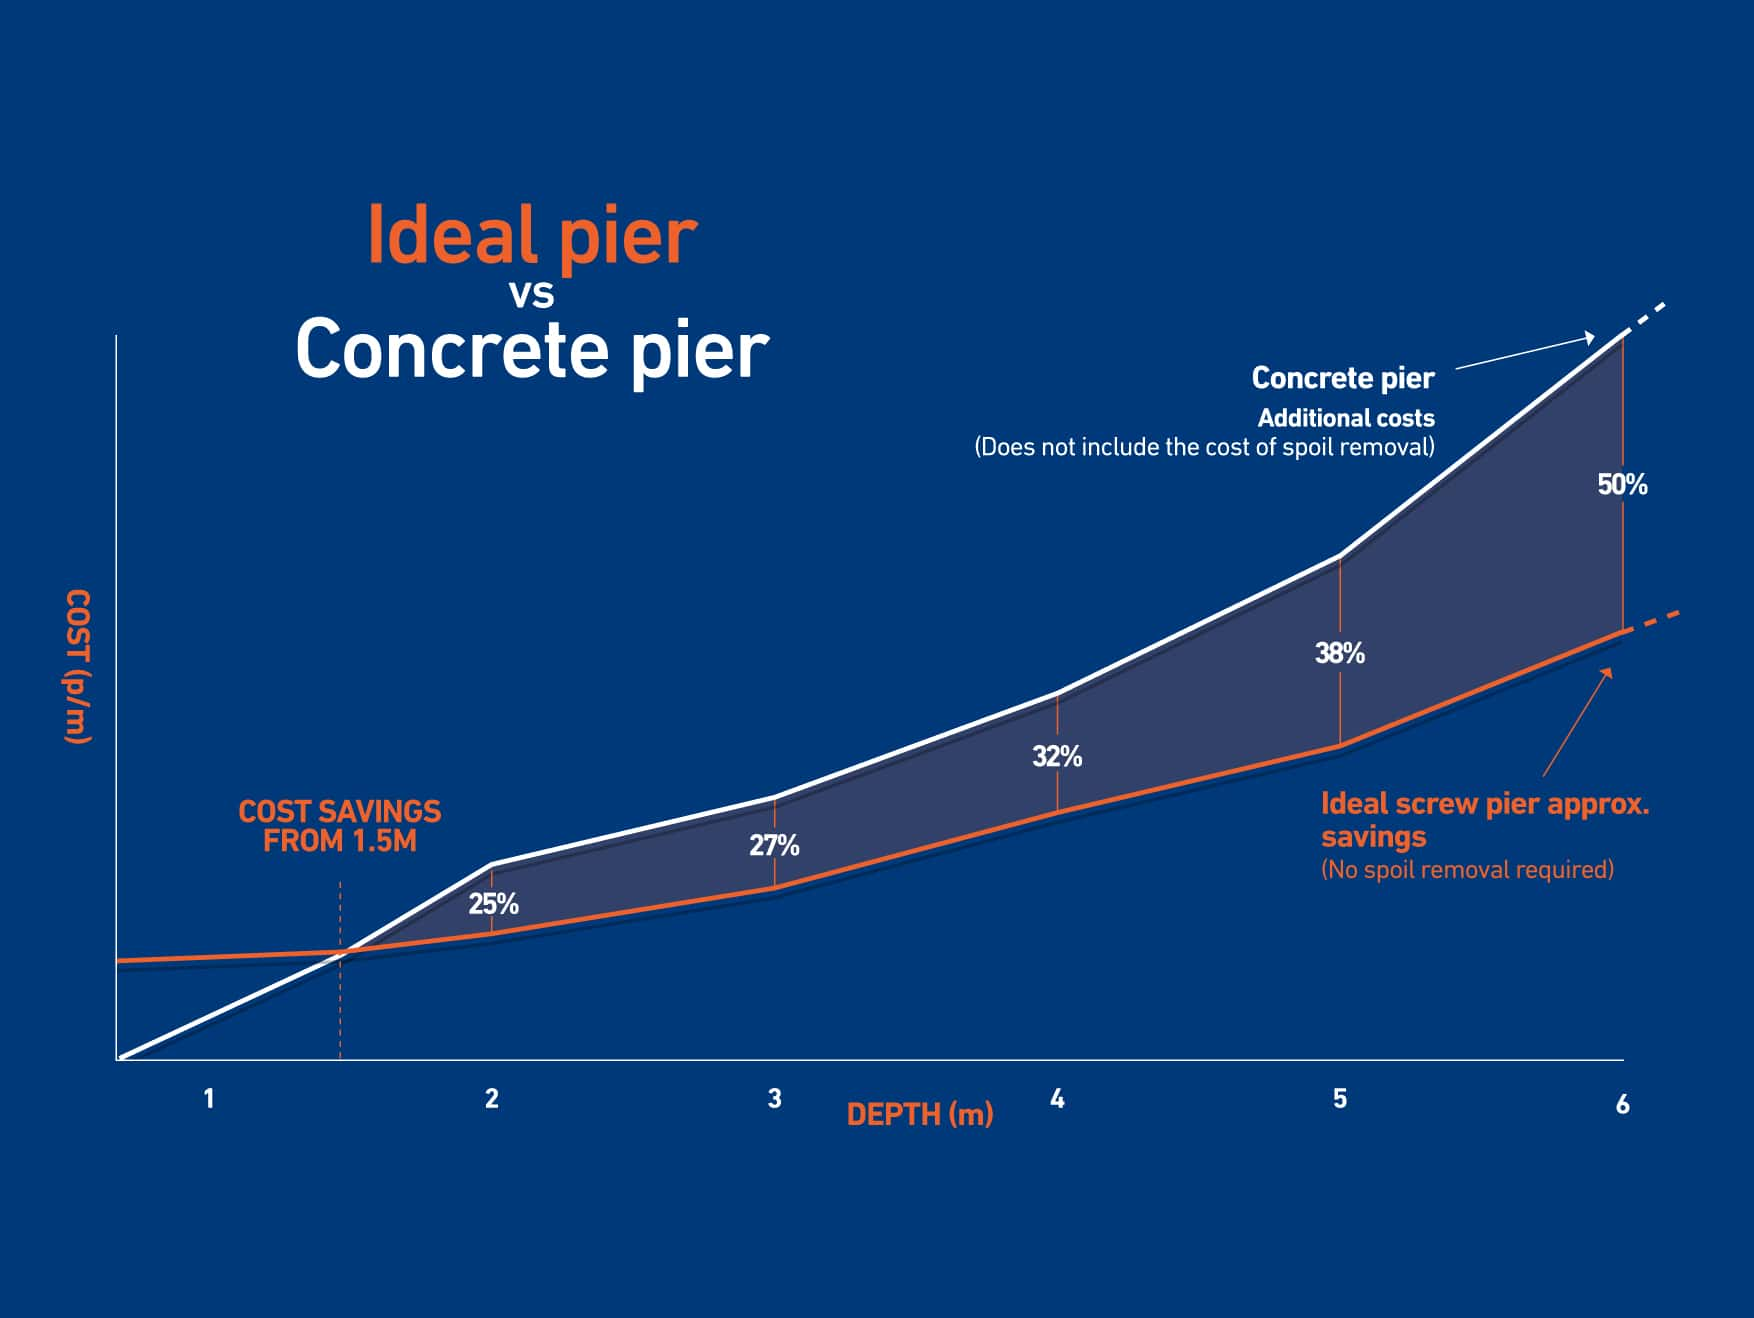 Benefits of Screw Piers/Piles vs Bored Concrete Piers - Ideal